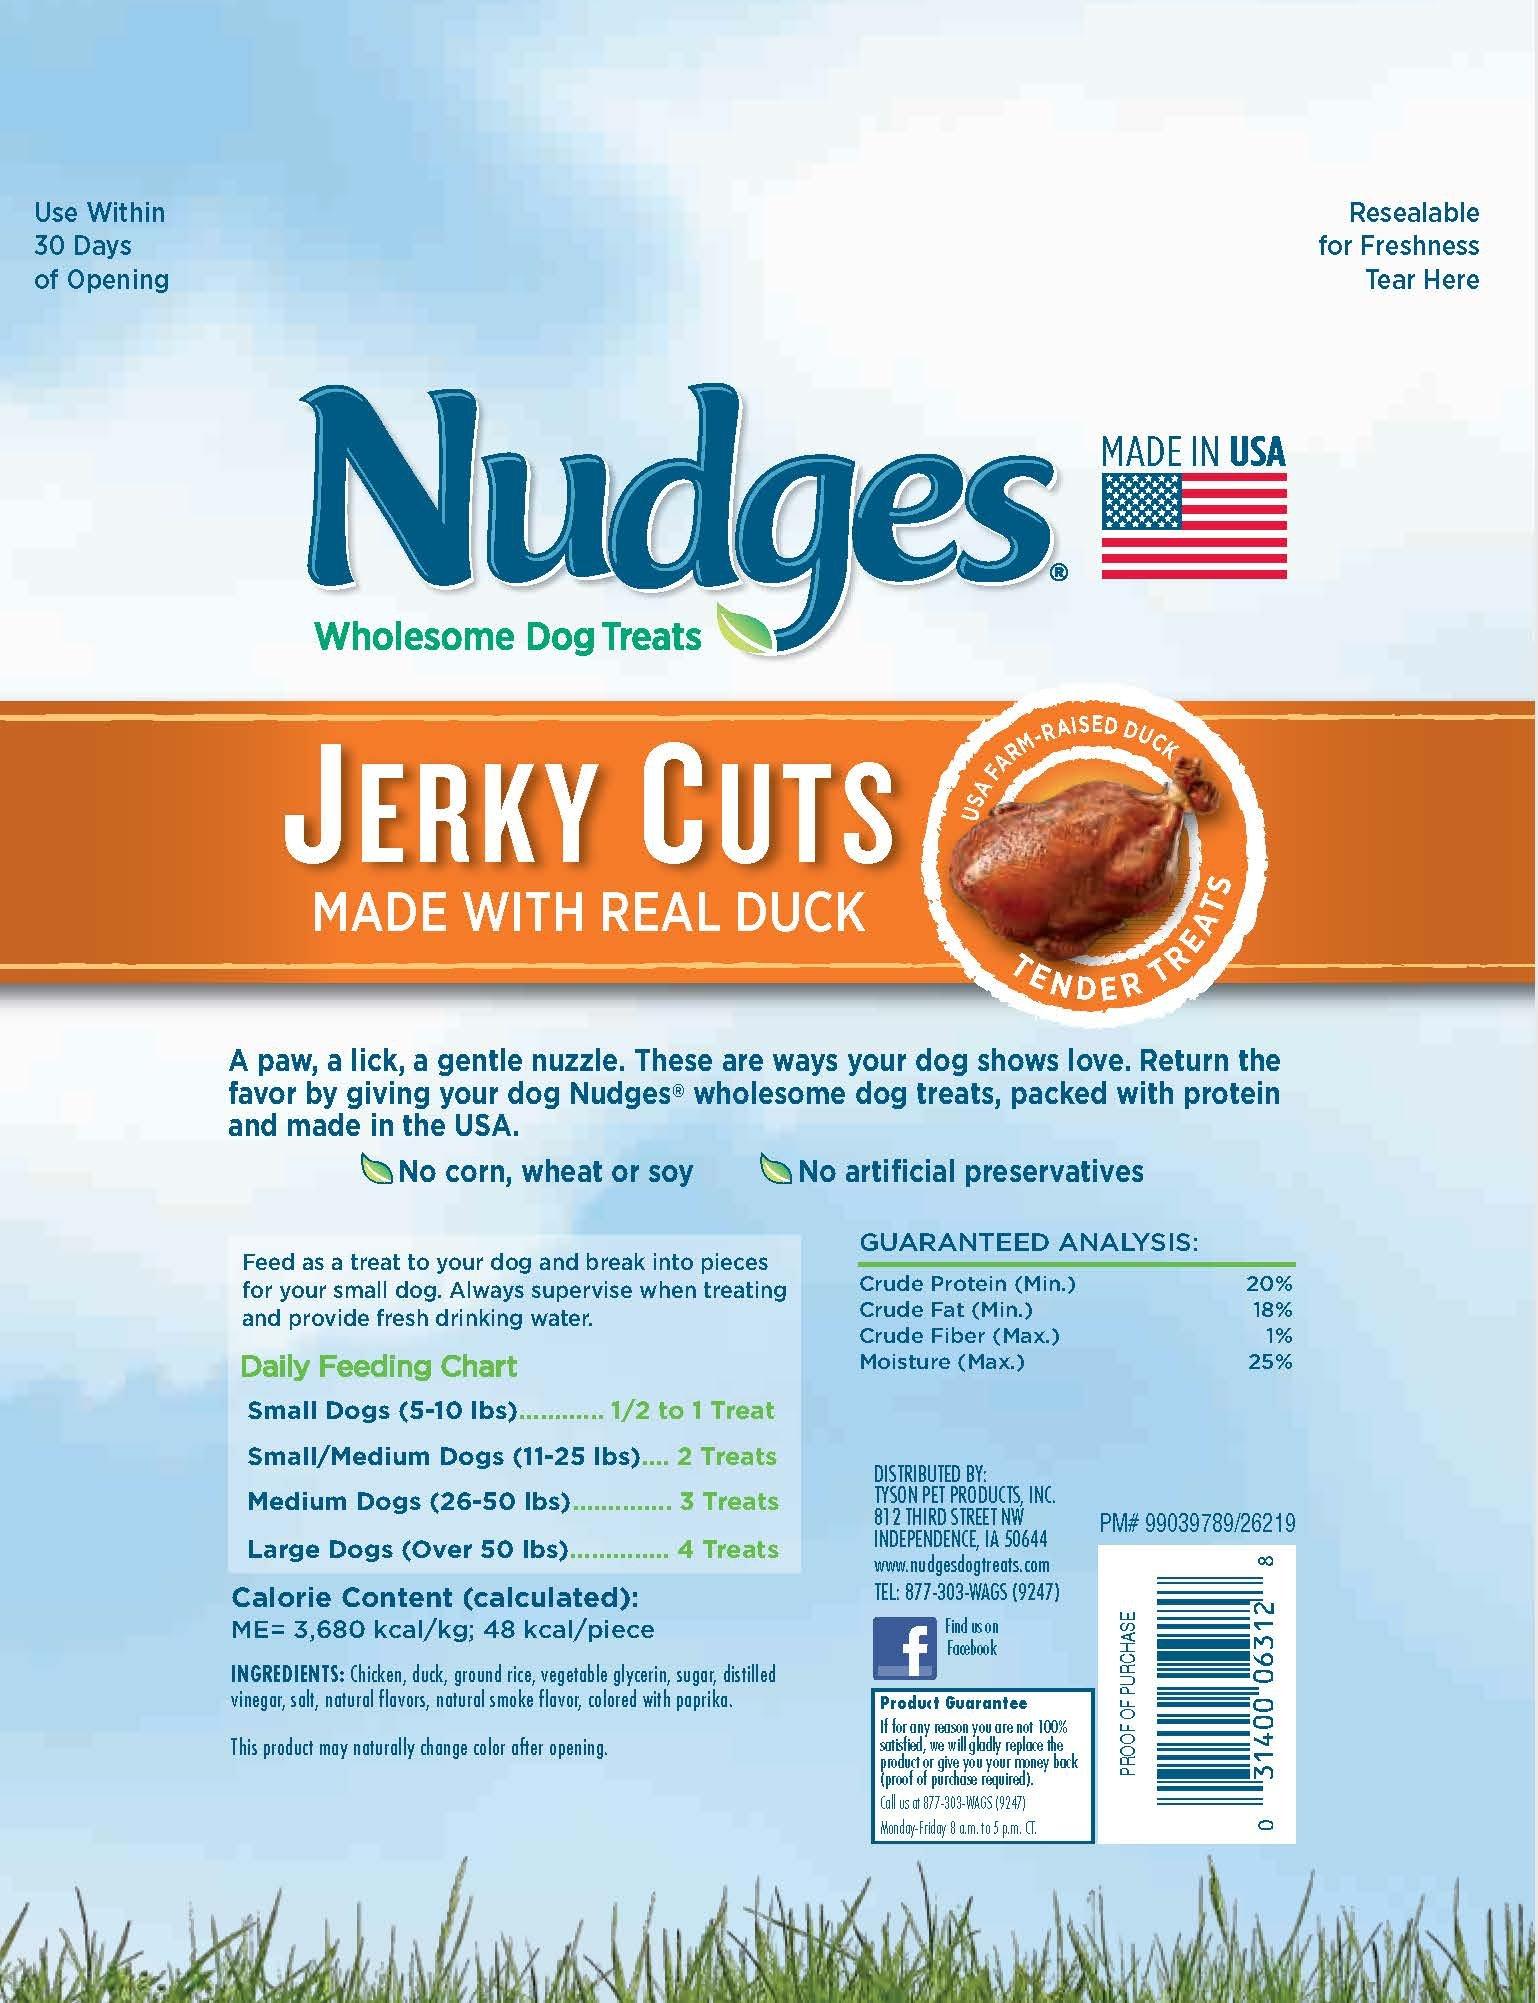 Nudges Jerky Cuts Dog Treats, Steak, 18 Ounce by Nudges (Image #1)